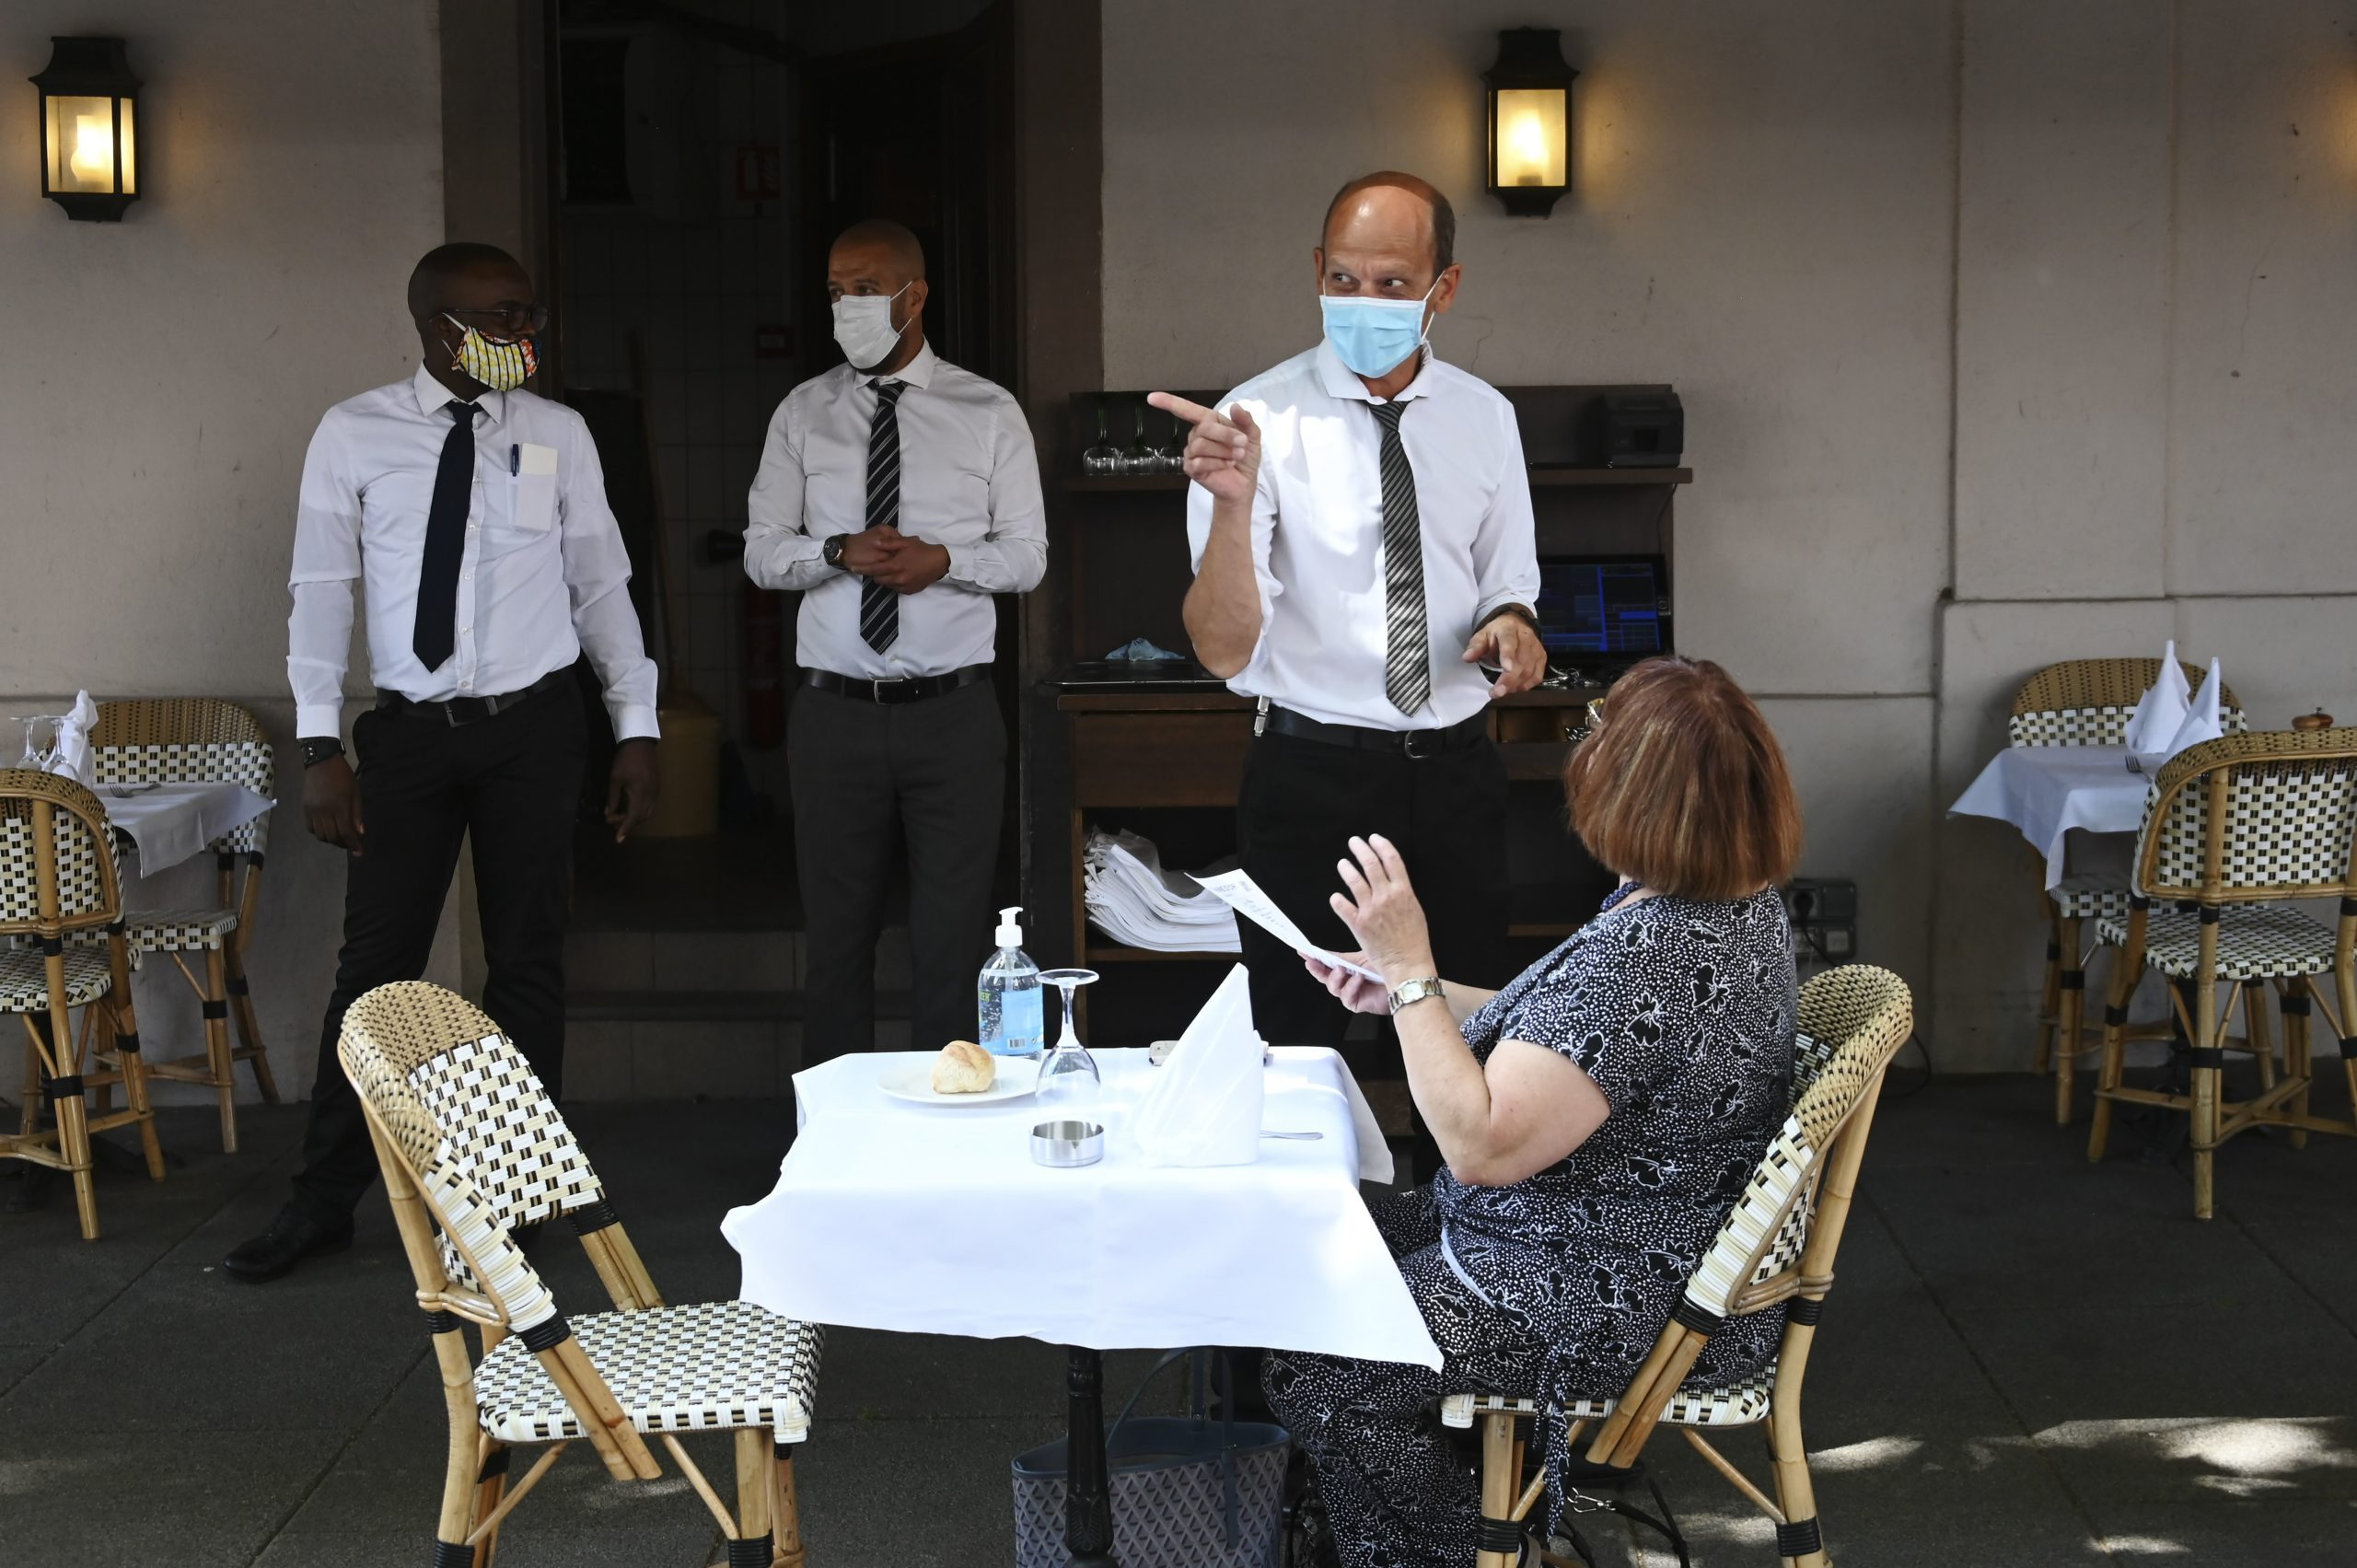 FRANCE-VIRUS-HEALTH